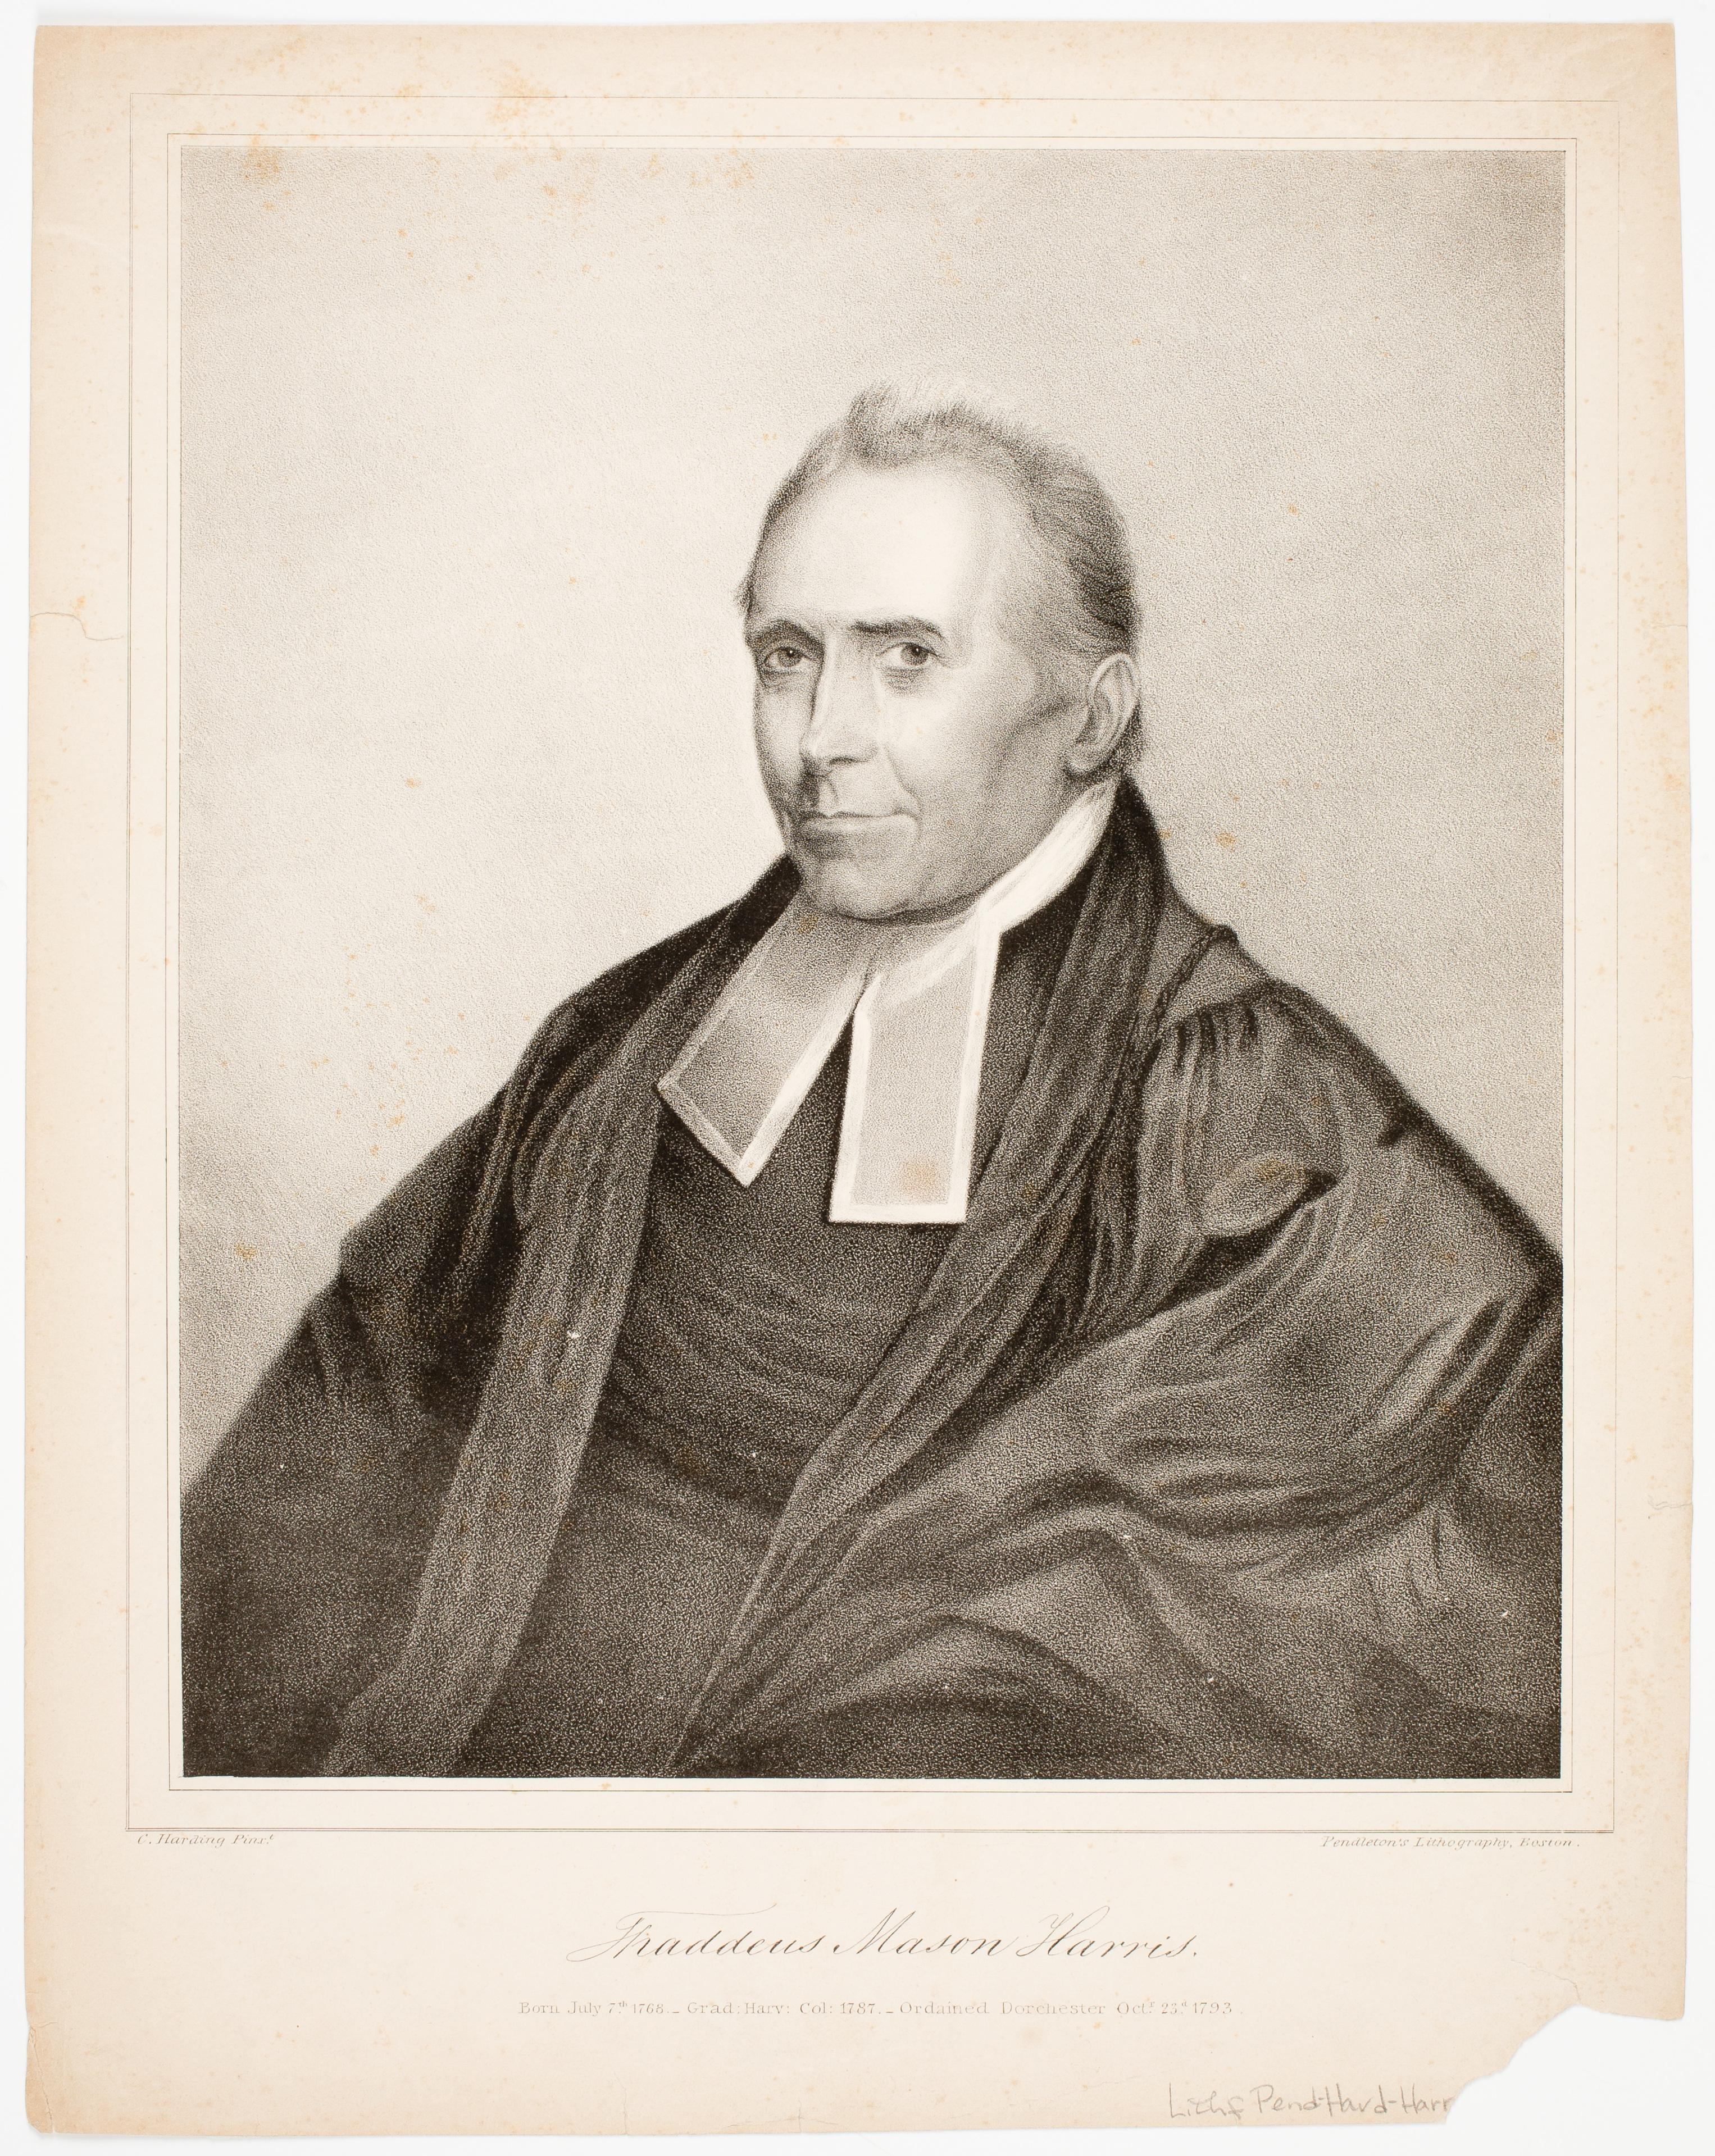 Lithograph of Thaddeus Mason Harris, circa 1830